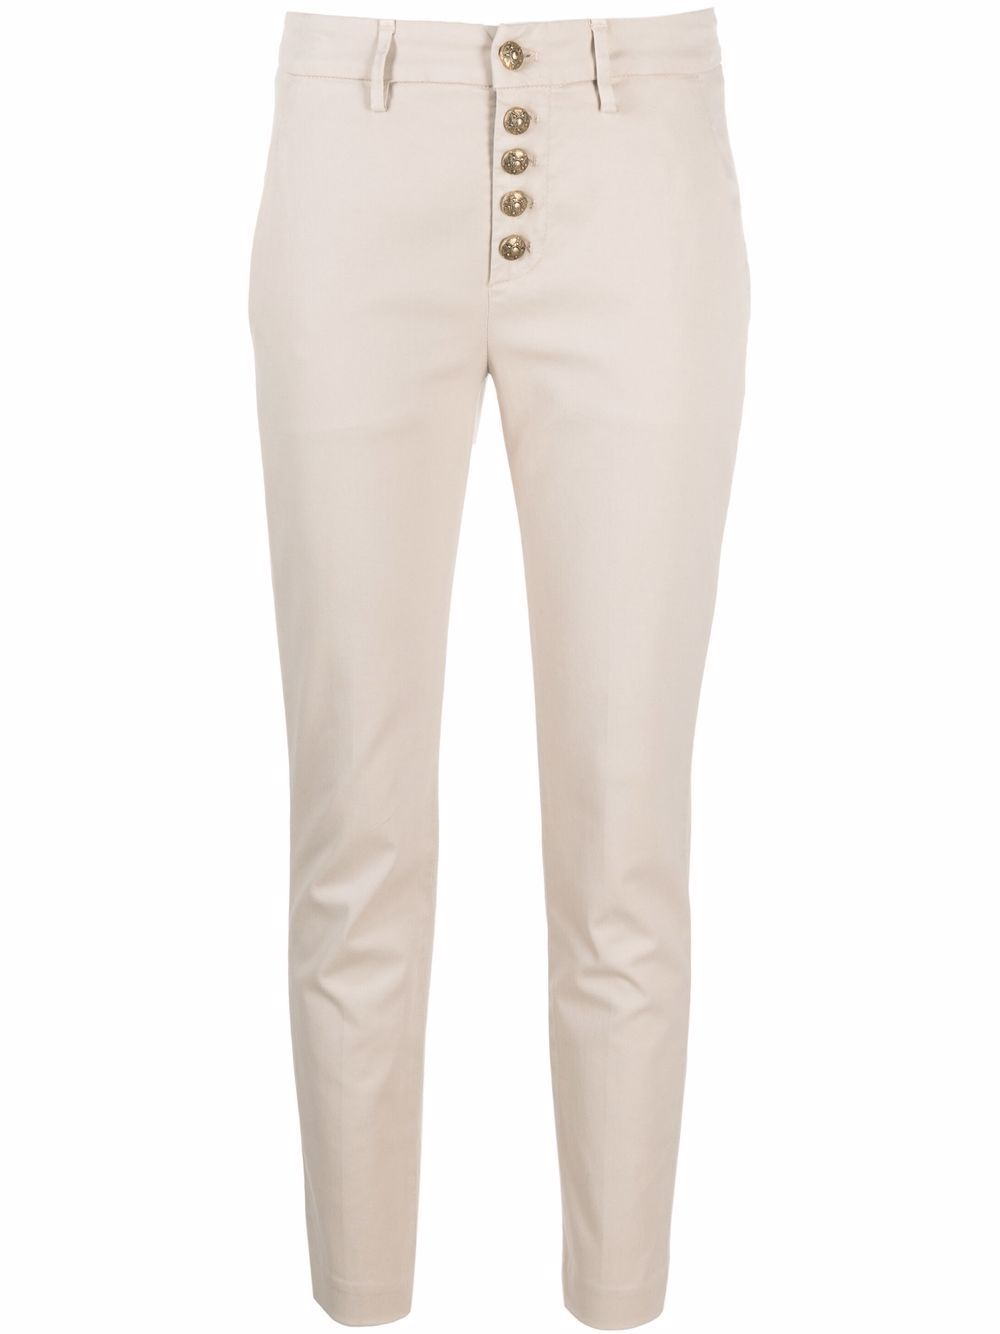 Pantalone carmen in cotone